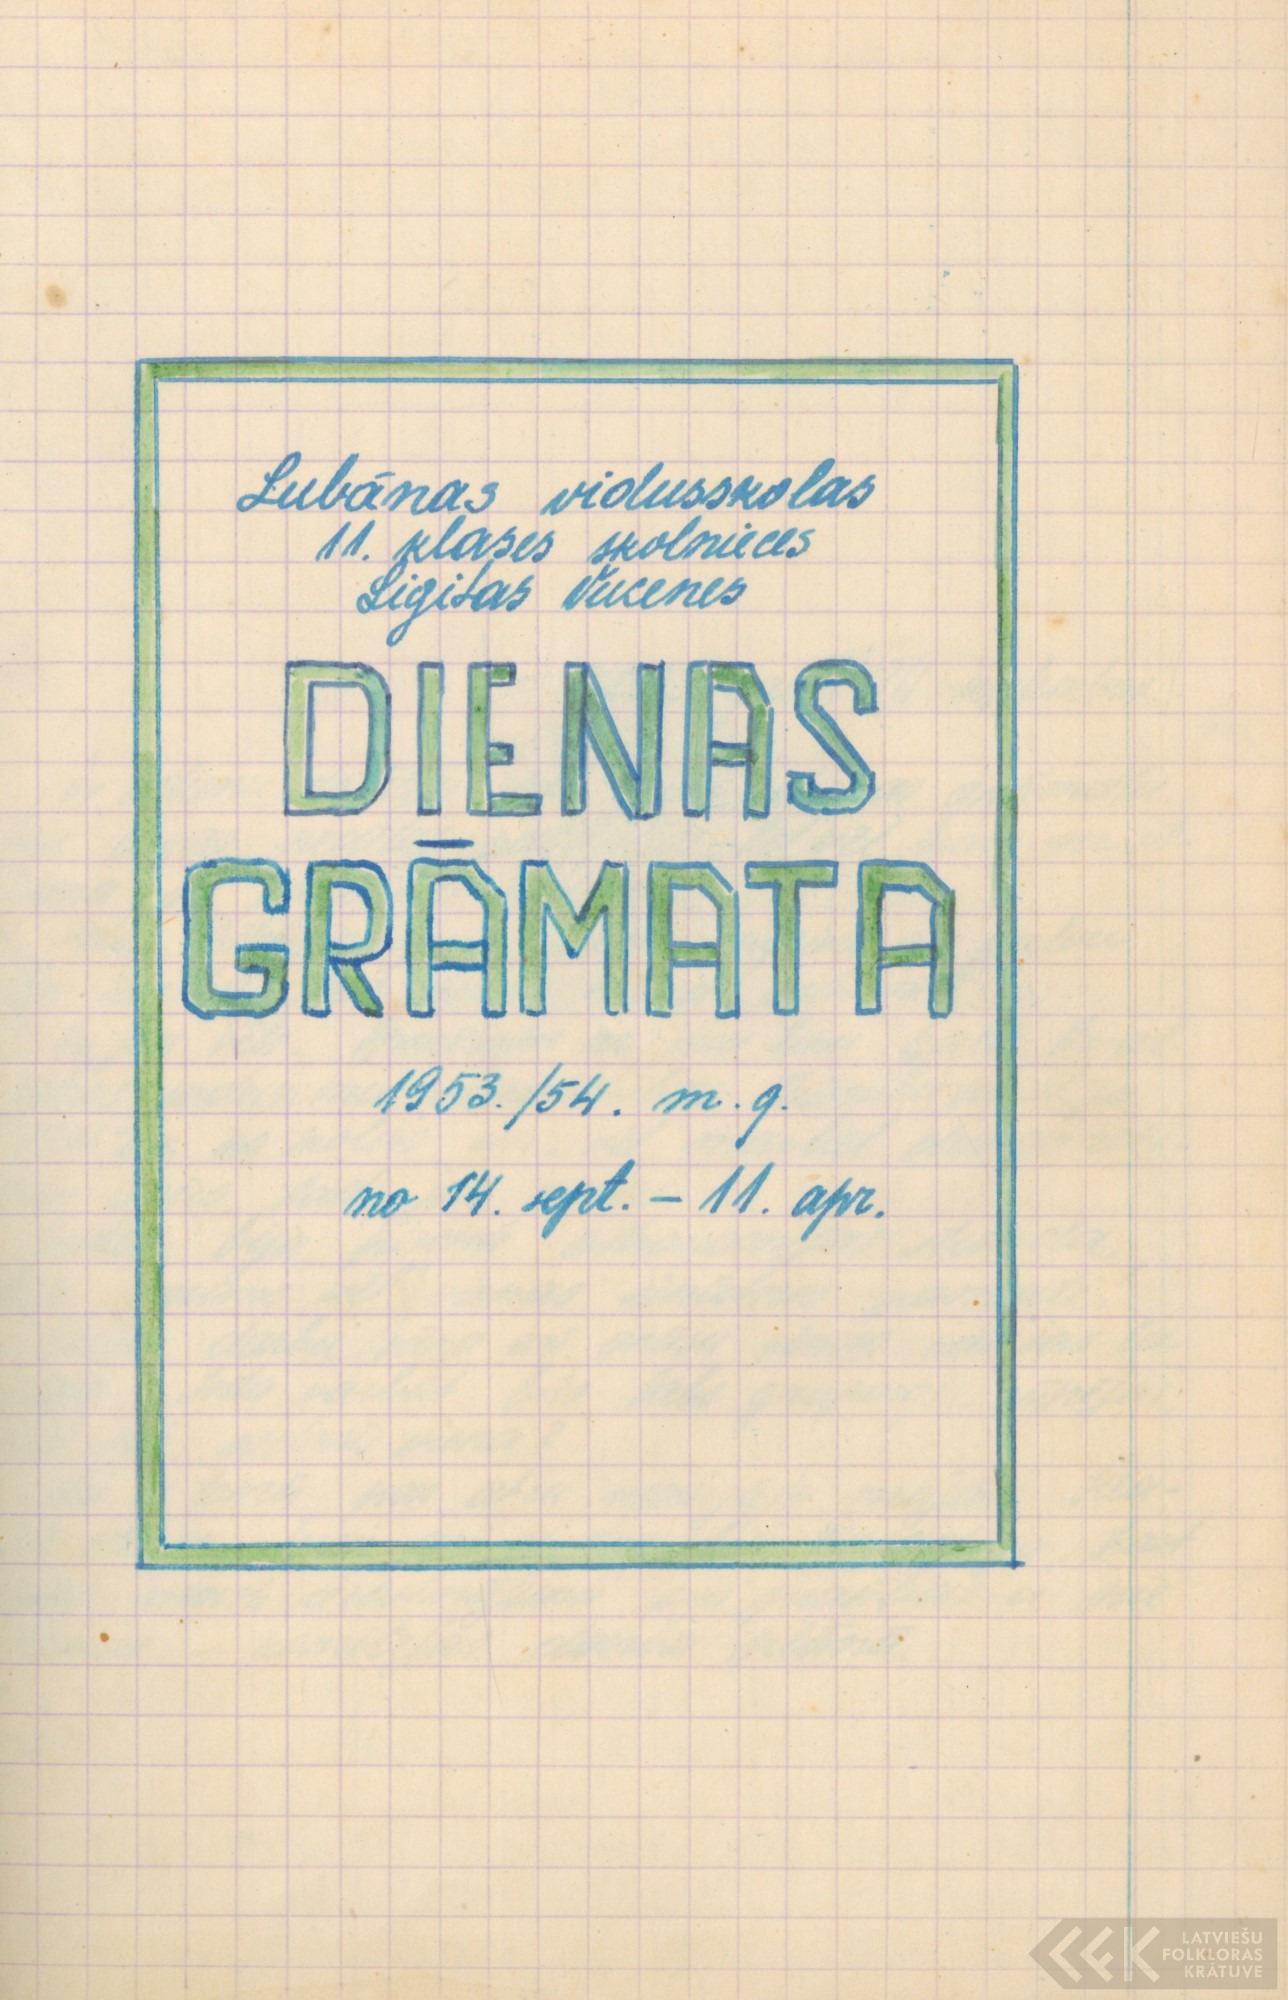 Ak161-Ligitas-Vucenas-dienasgramatas-01-0003-5e835a79d53d8.jpg